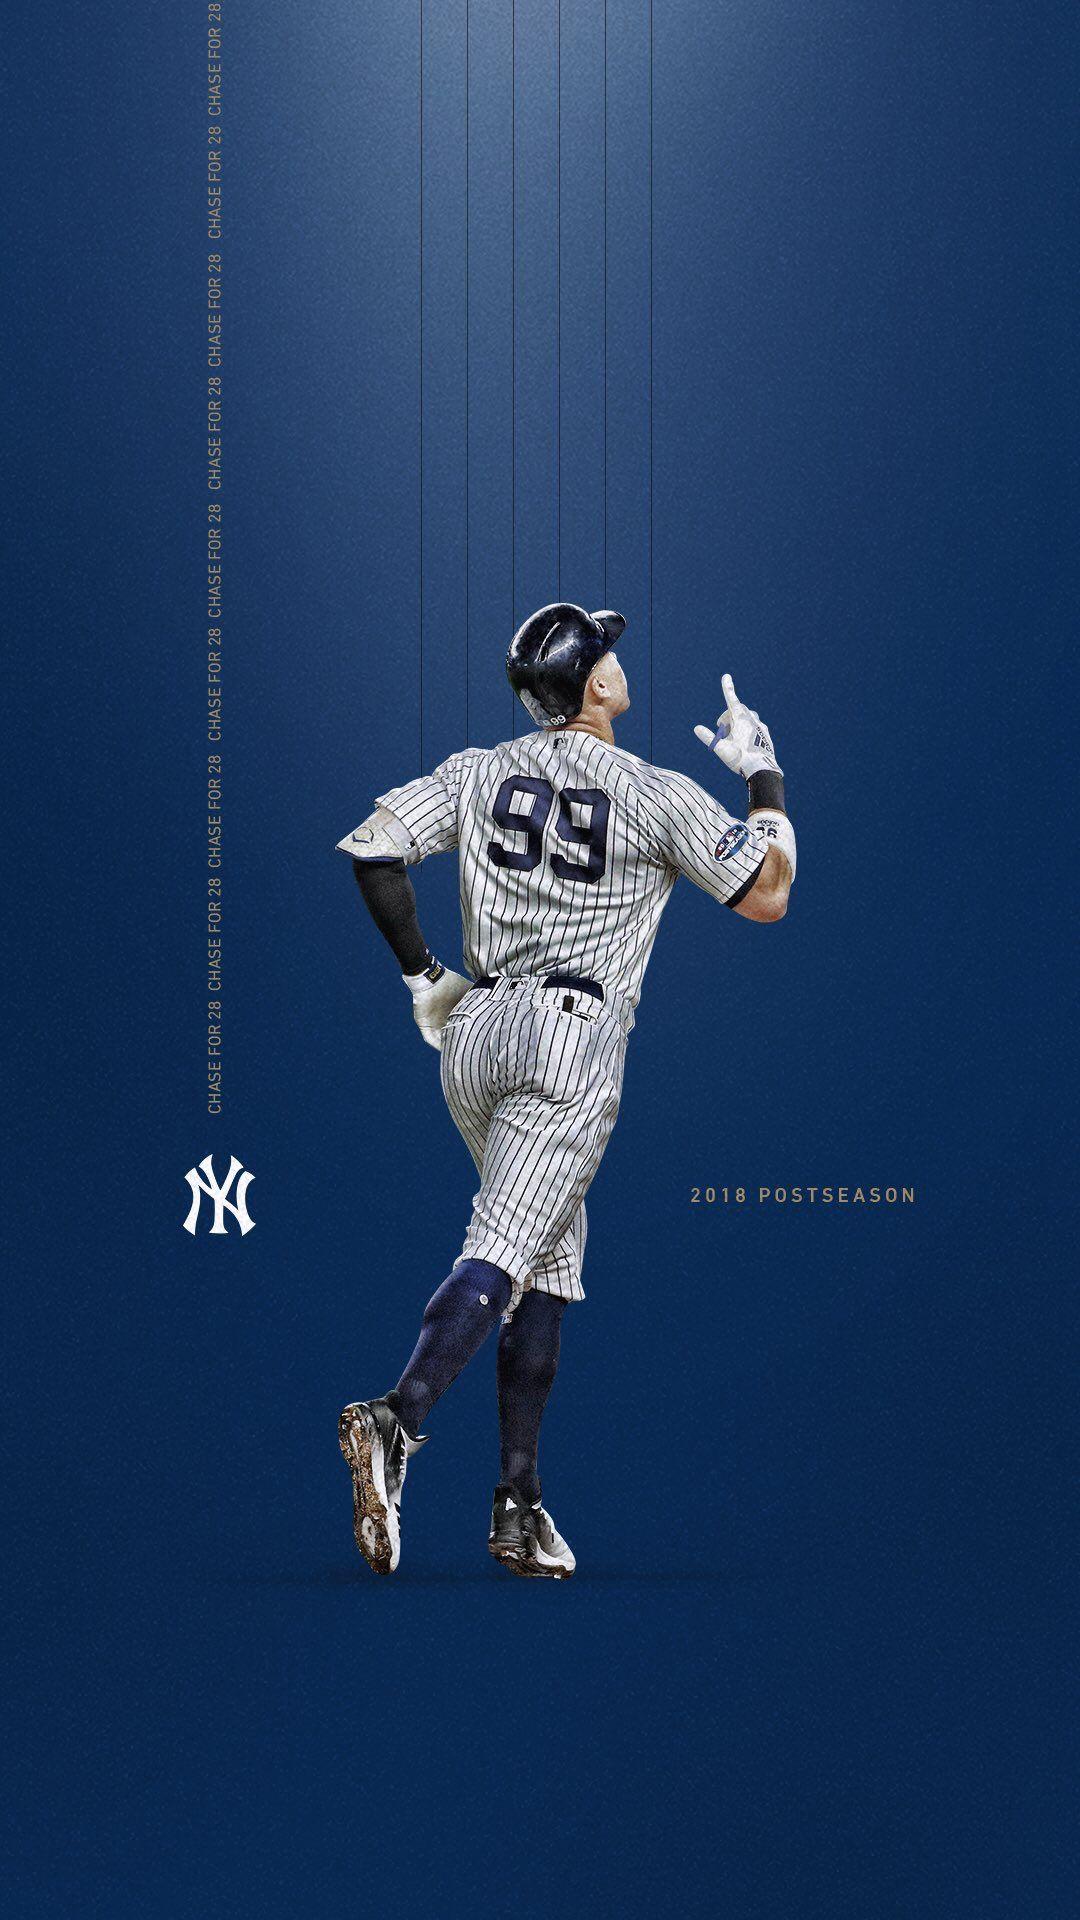 Pin By Daniel Slovis On Edits Yankees Baseball New York Yankees Yankees Roster